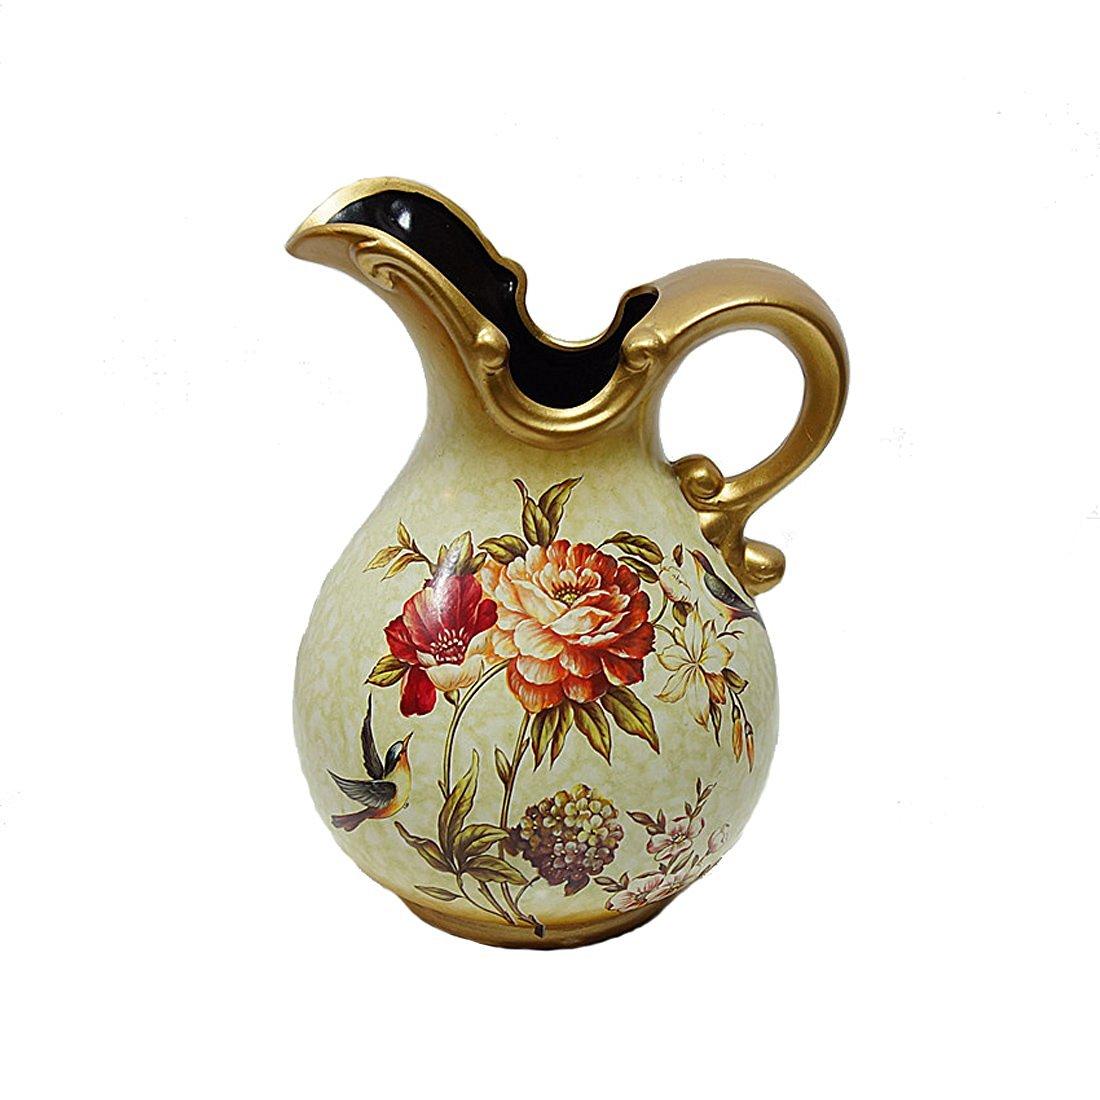 European Style Retro Ceramic Vase American Country Retro Flower Vase Table Painting Ceramic Vase Home Furnishing Floral Decoration Vase Wedding Decoration Vase